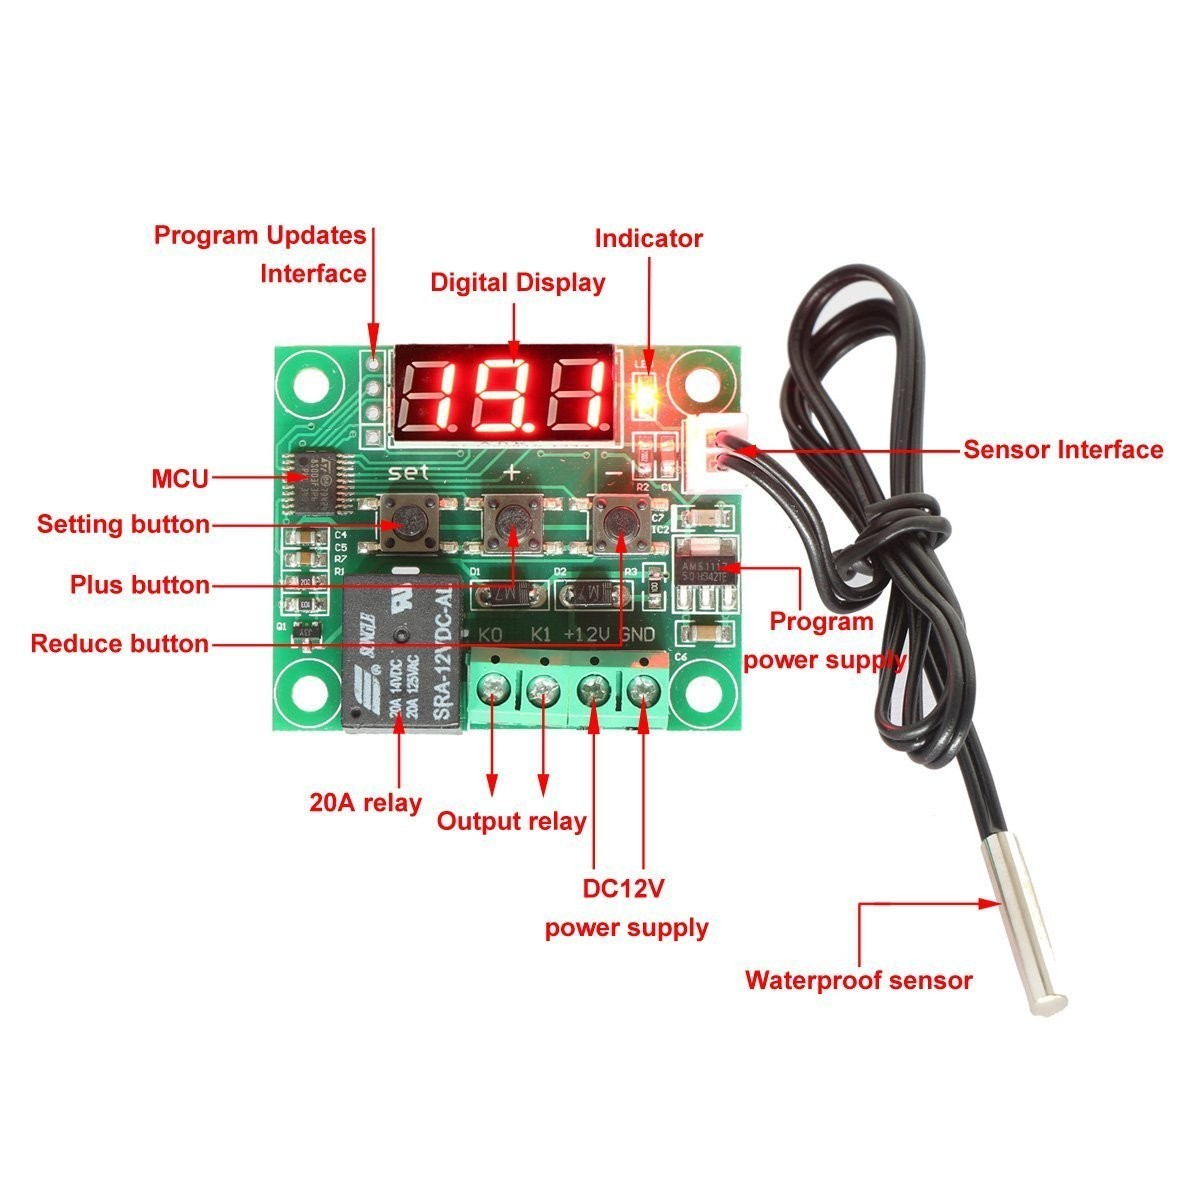 50 110 c w1209 digital thermostat temperature control switch 12v sensor 3d printing arduino. Black Bedroom Furniture Sets. Home Design Ideas